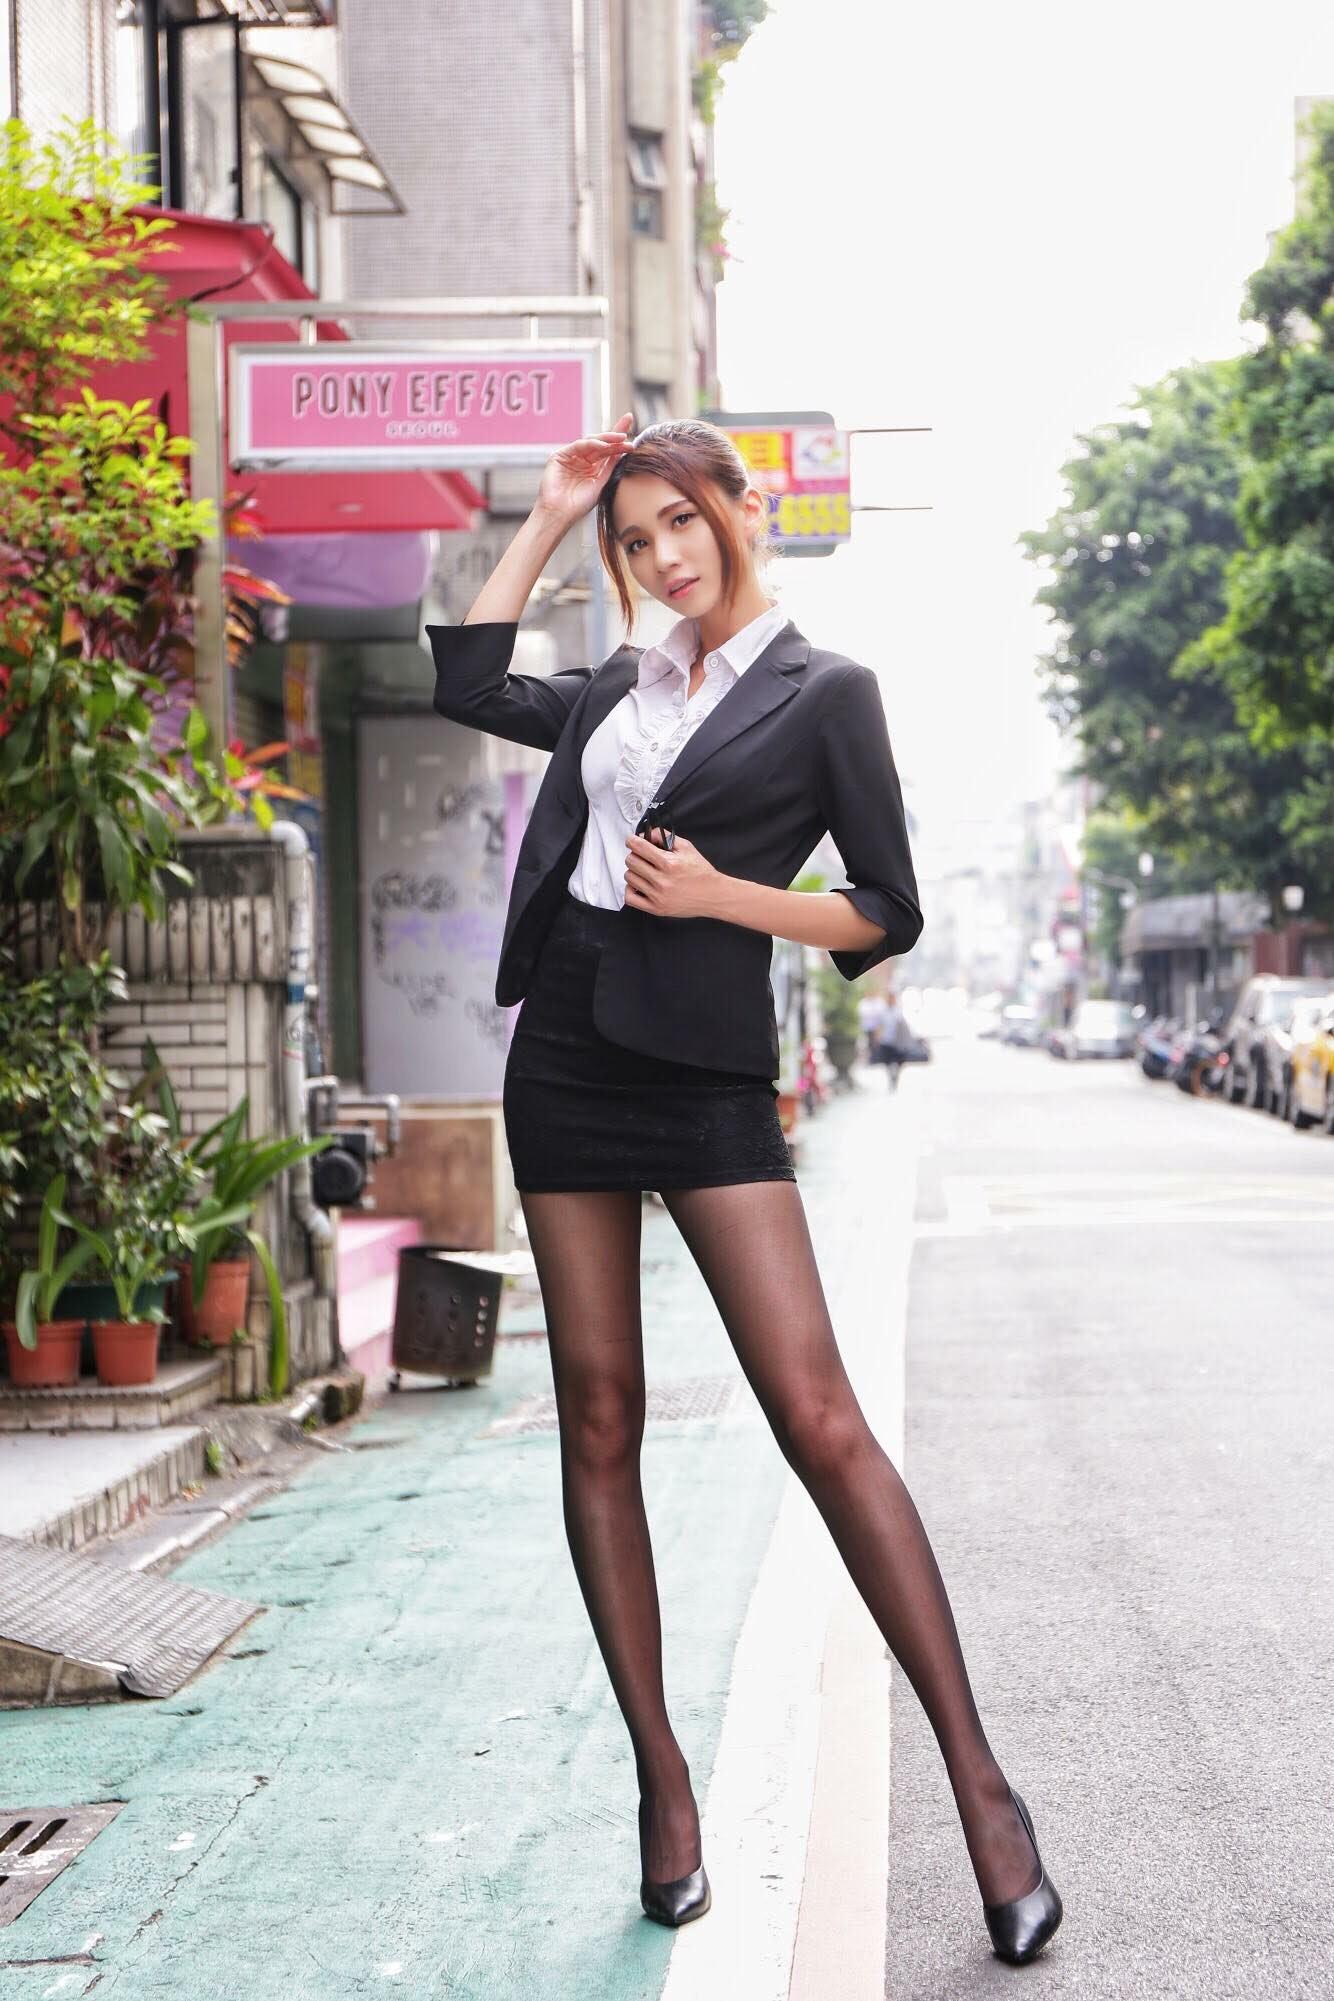 台湾美女CandiceのOL美脚 16